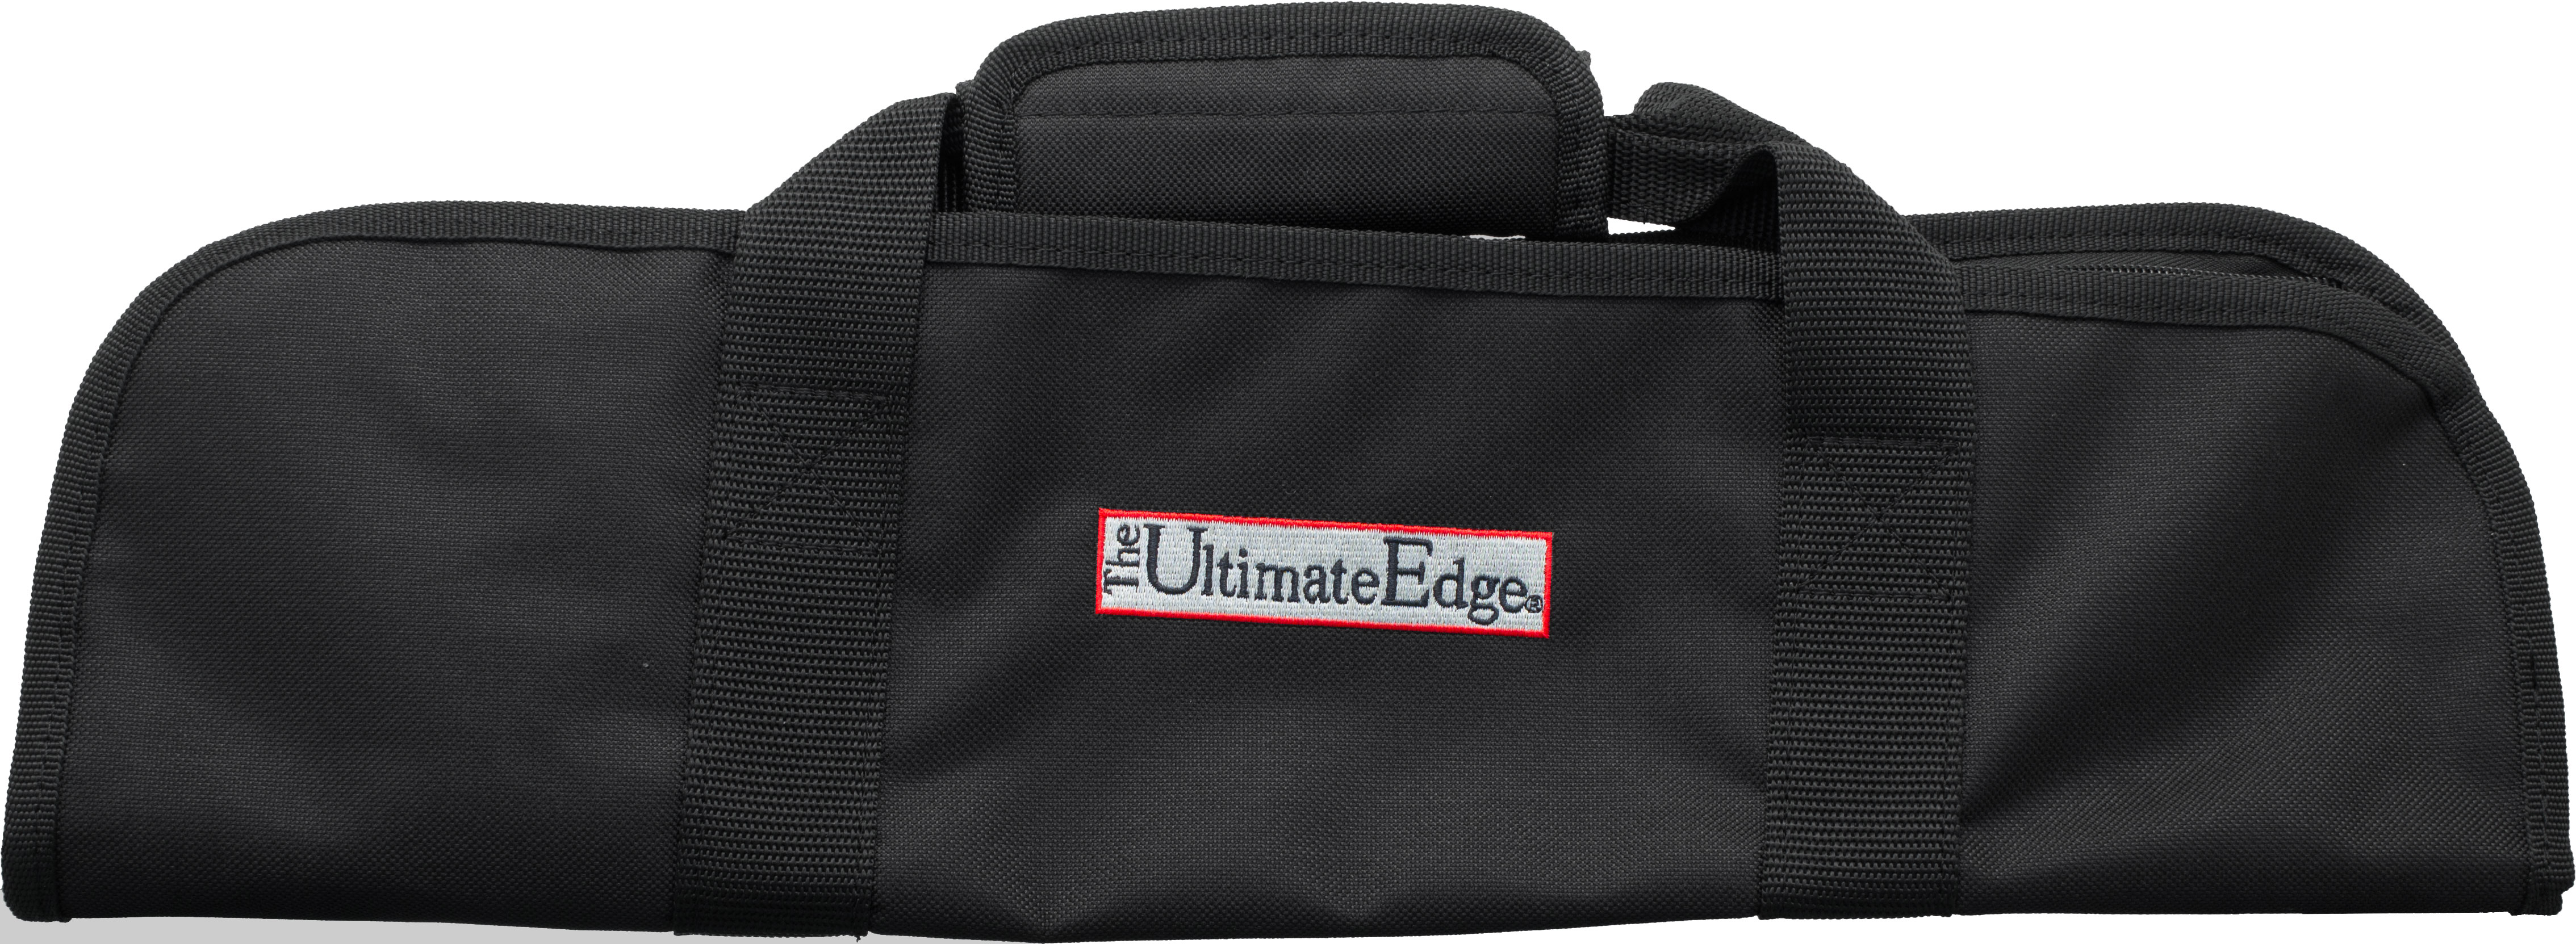 The Ultimate Edge 5 Piece Knife Case, Black